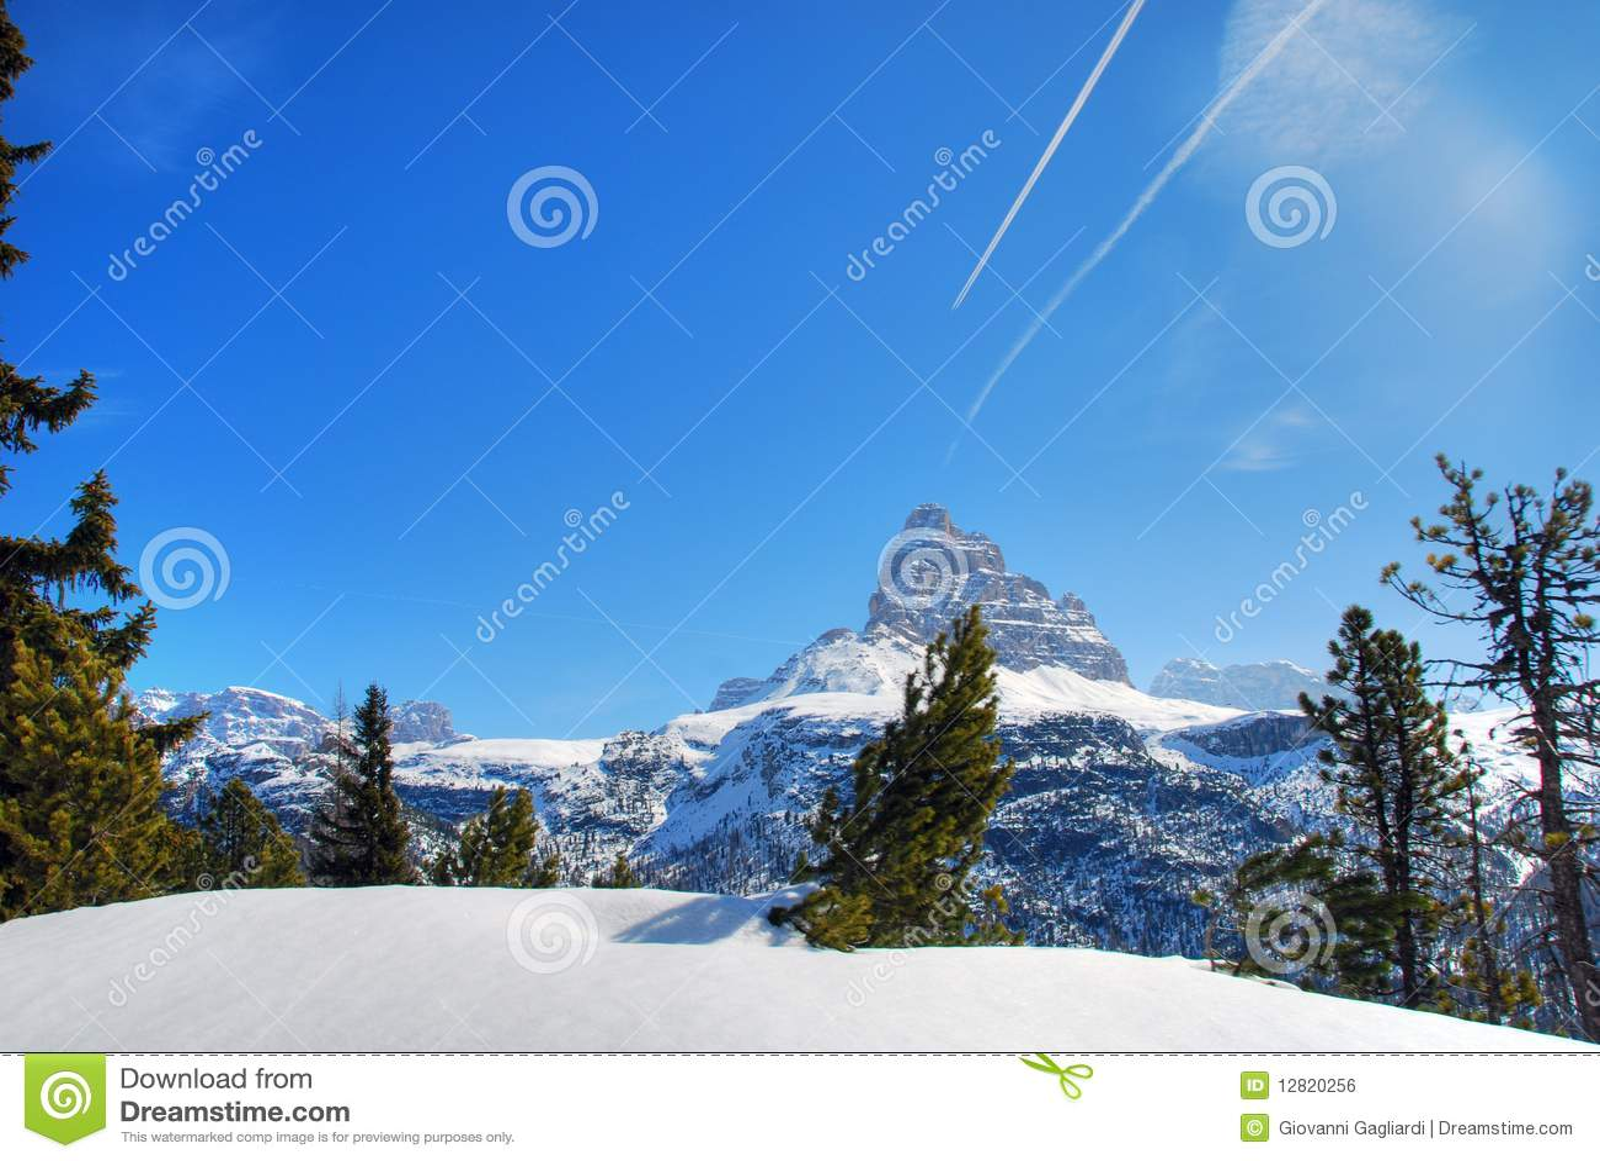 Alps Winter, Dolomites, Italy, 2007 Royalty Free Stock Image - Image: 12820256